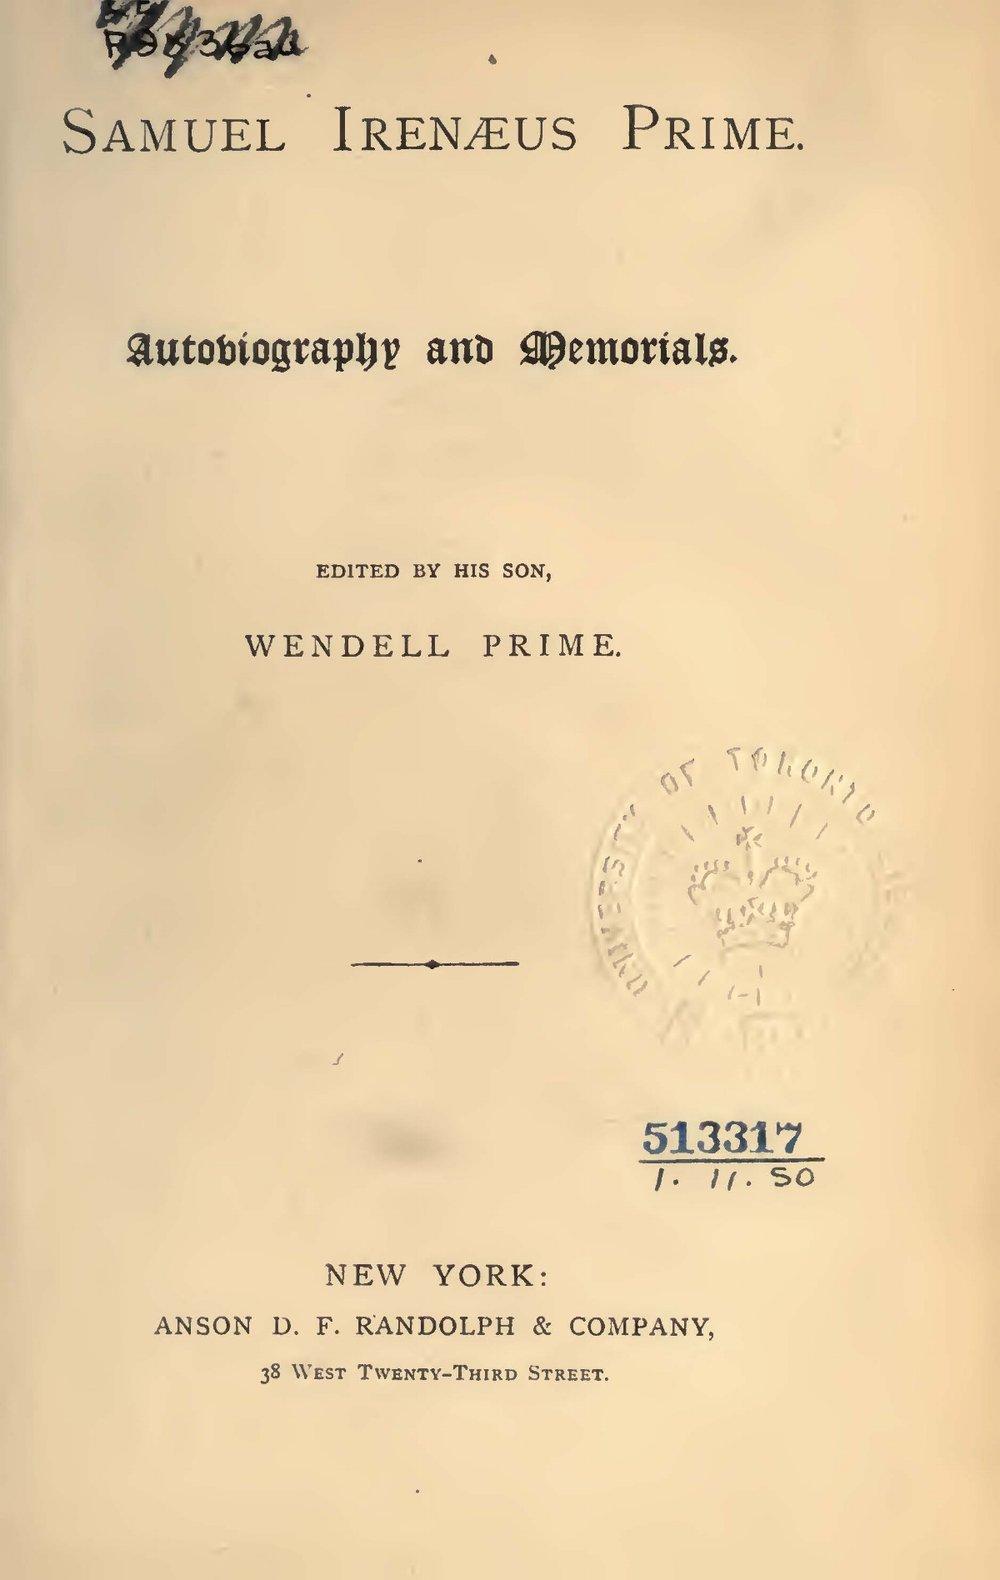 Prime, Samuel Irenaeus, Autobiography and Memorials Title Page.jpg